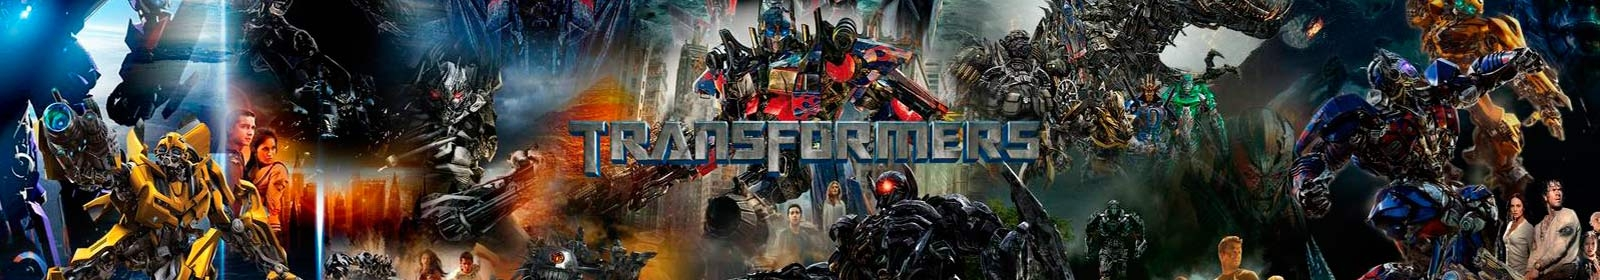 Comprar Transformers online